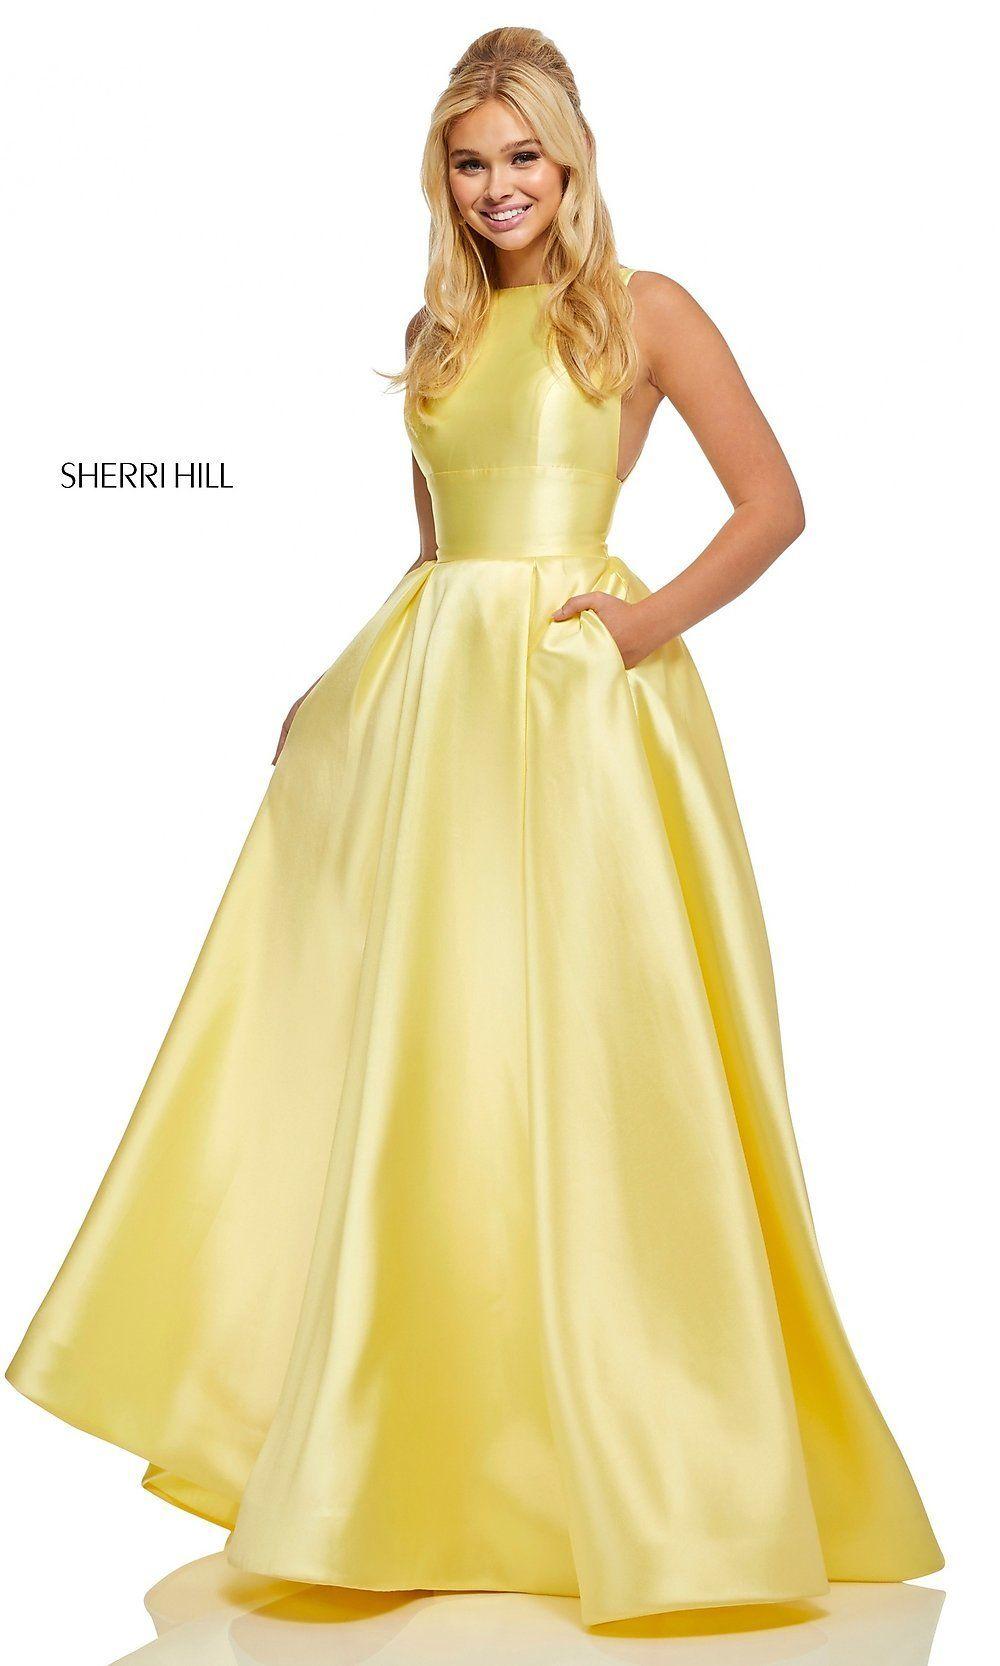 40d78179cd Sherri Hill High-Neck A-Line Formal Gown